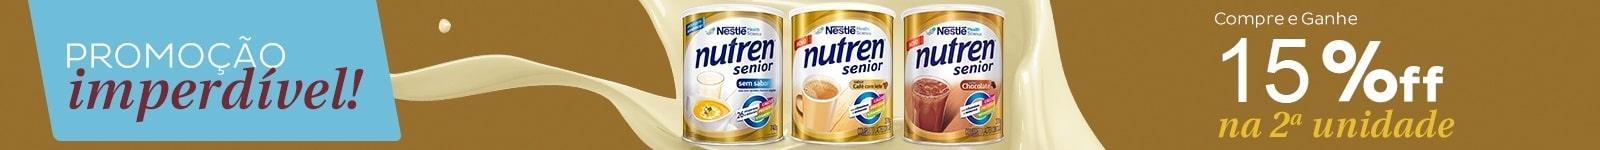 Nutren_Senior_DePor